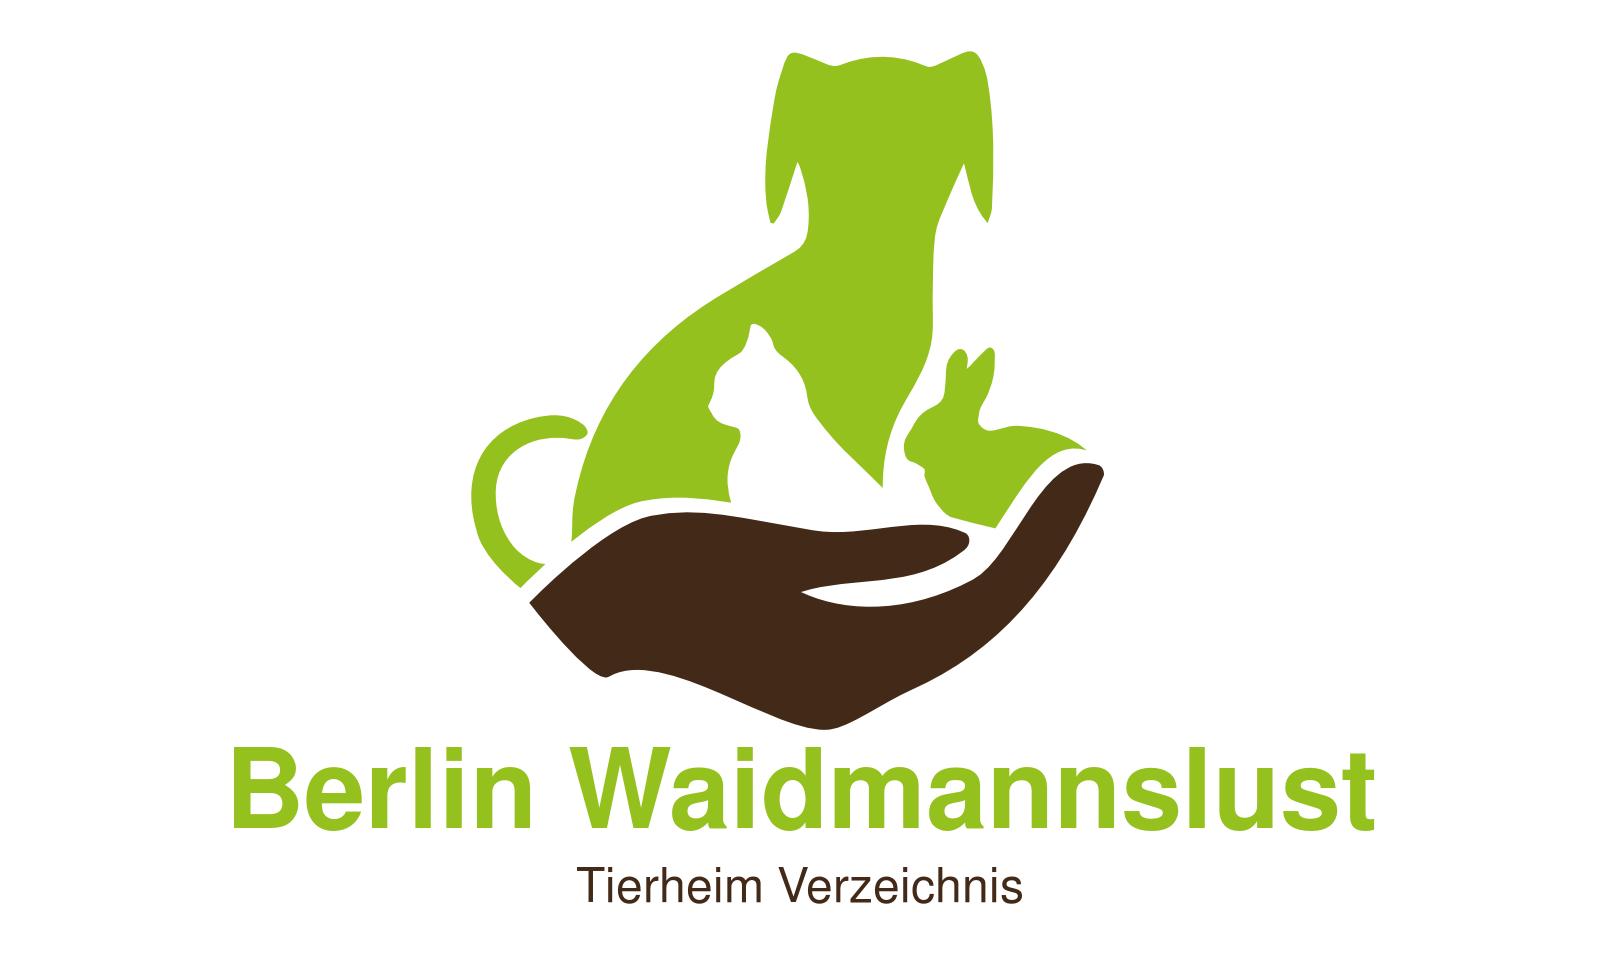 Tierheim Berlin Waidmannslust